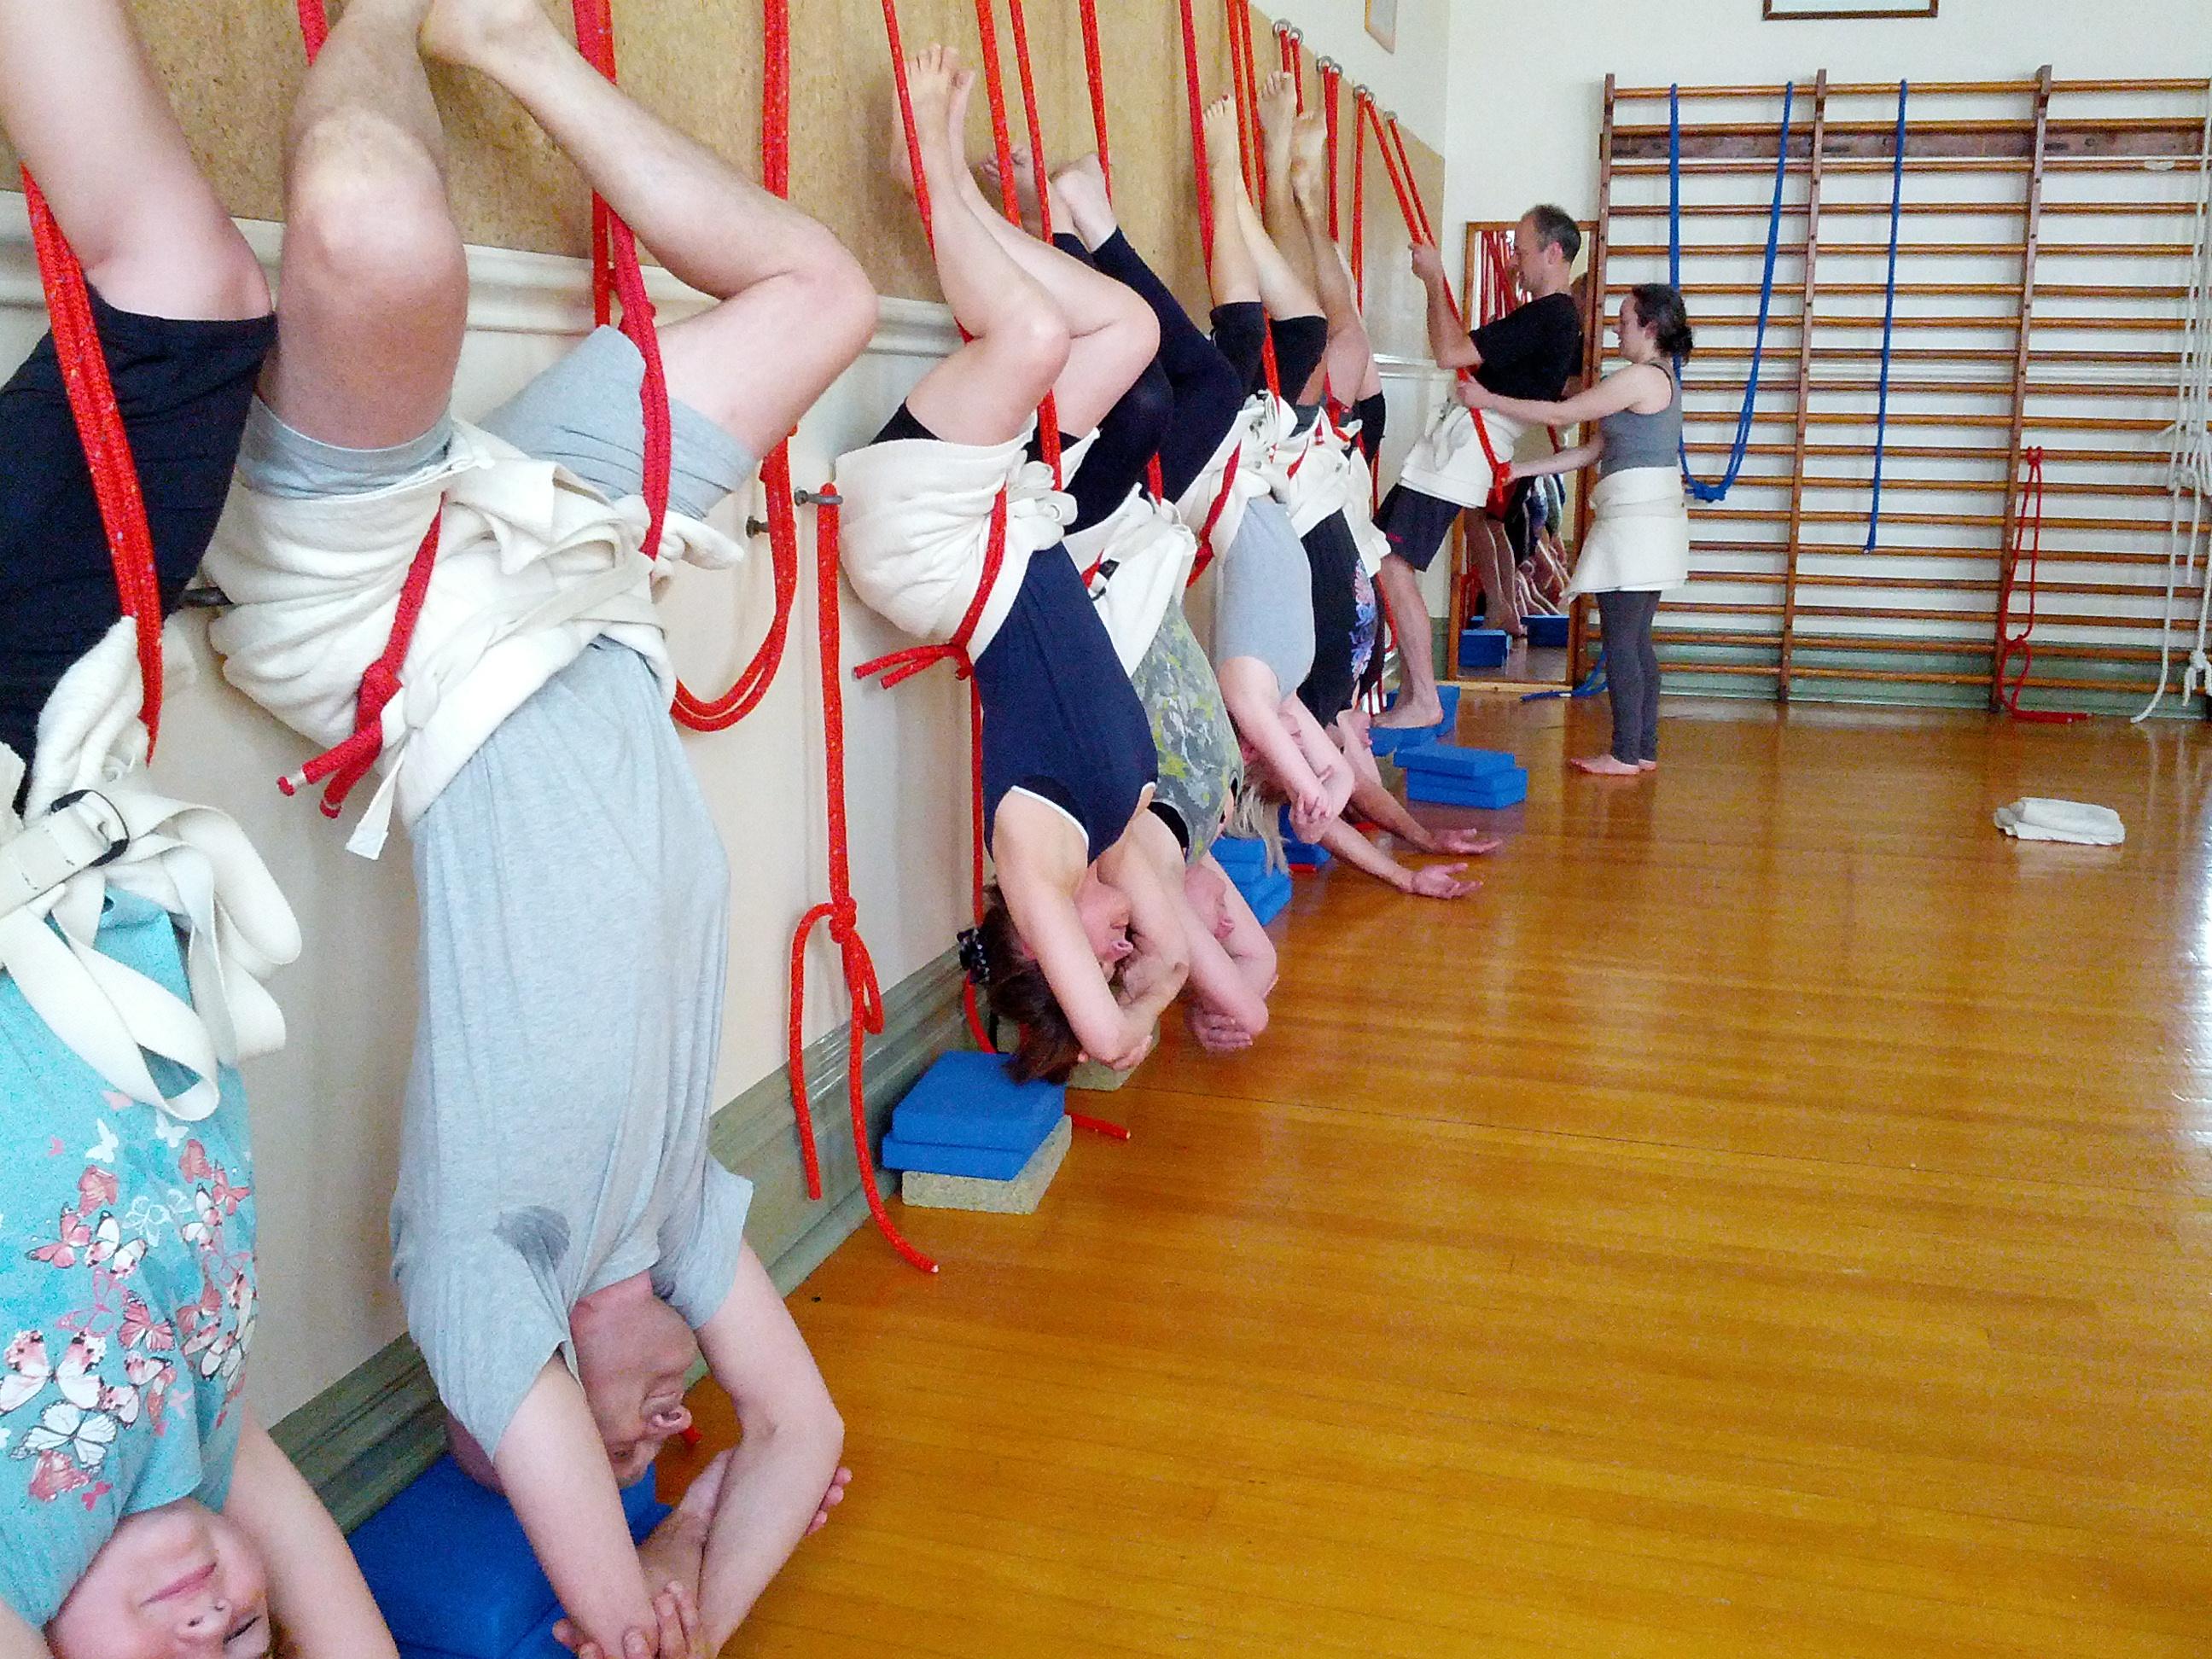 Yoga rope benefits